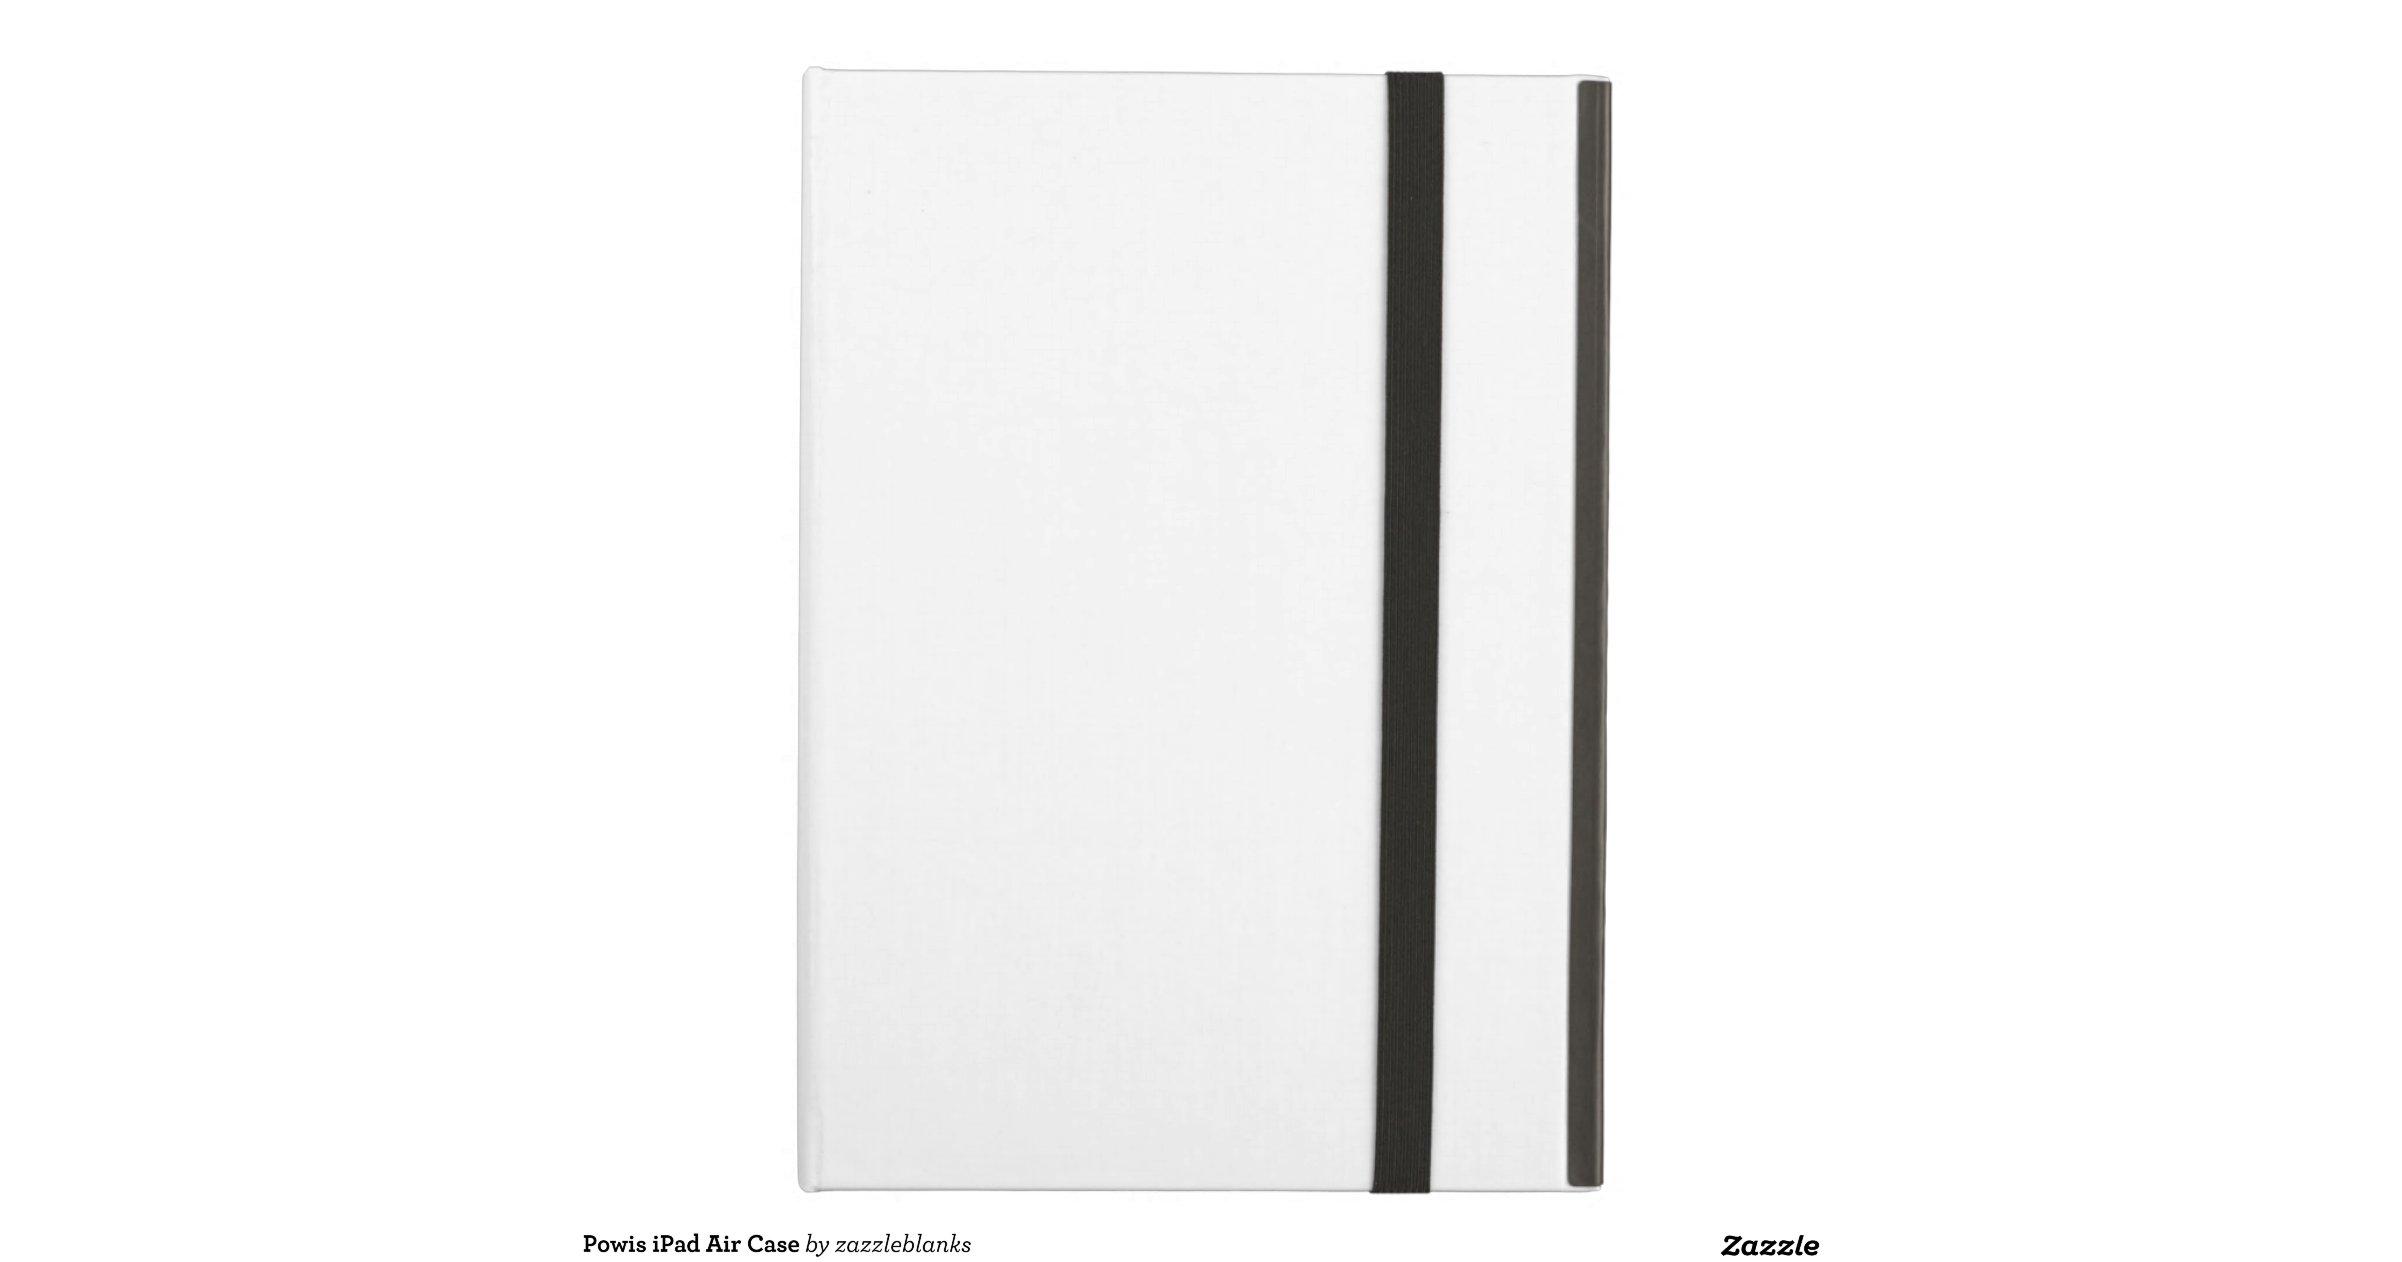 powis_ipad_air_case-r9abf63be32a64ace93f5500b36f09886